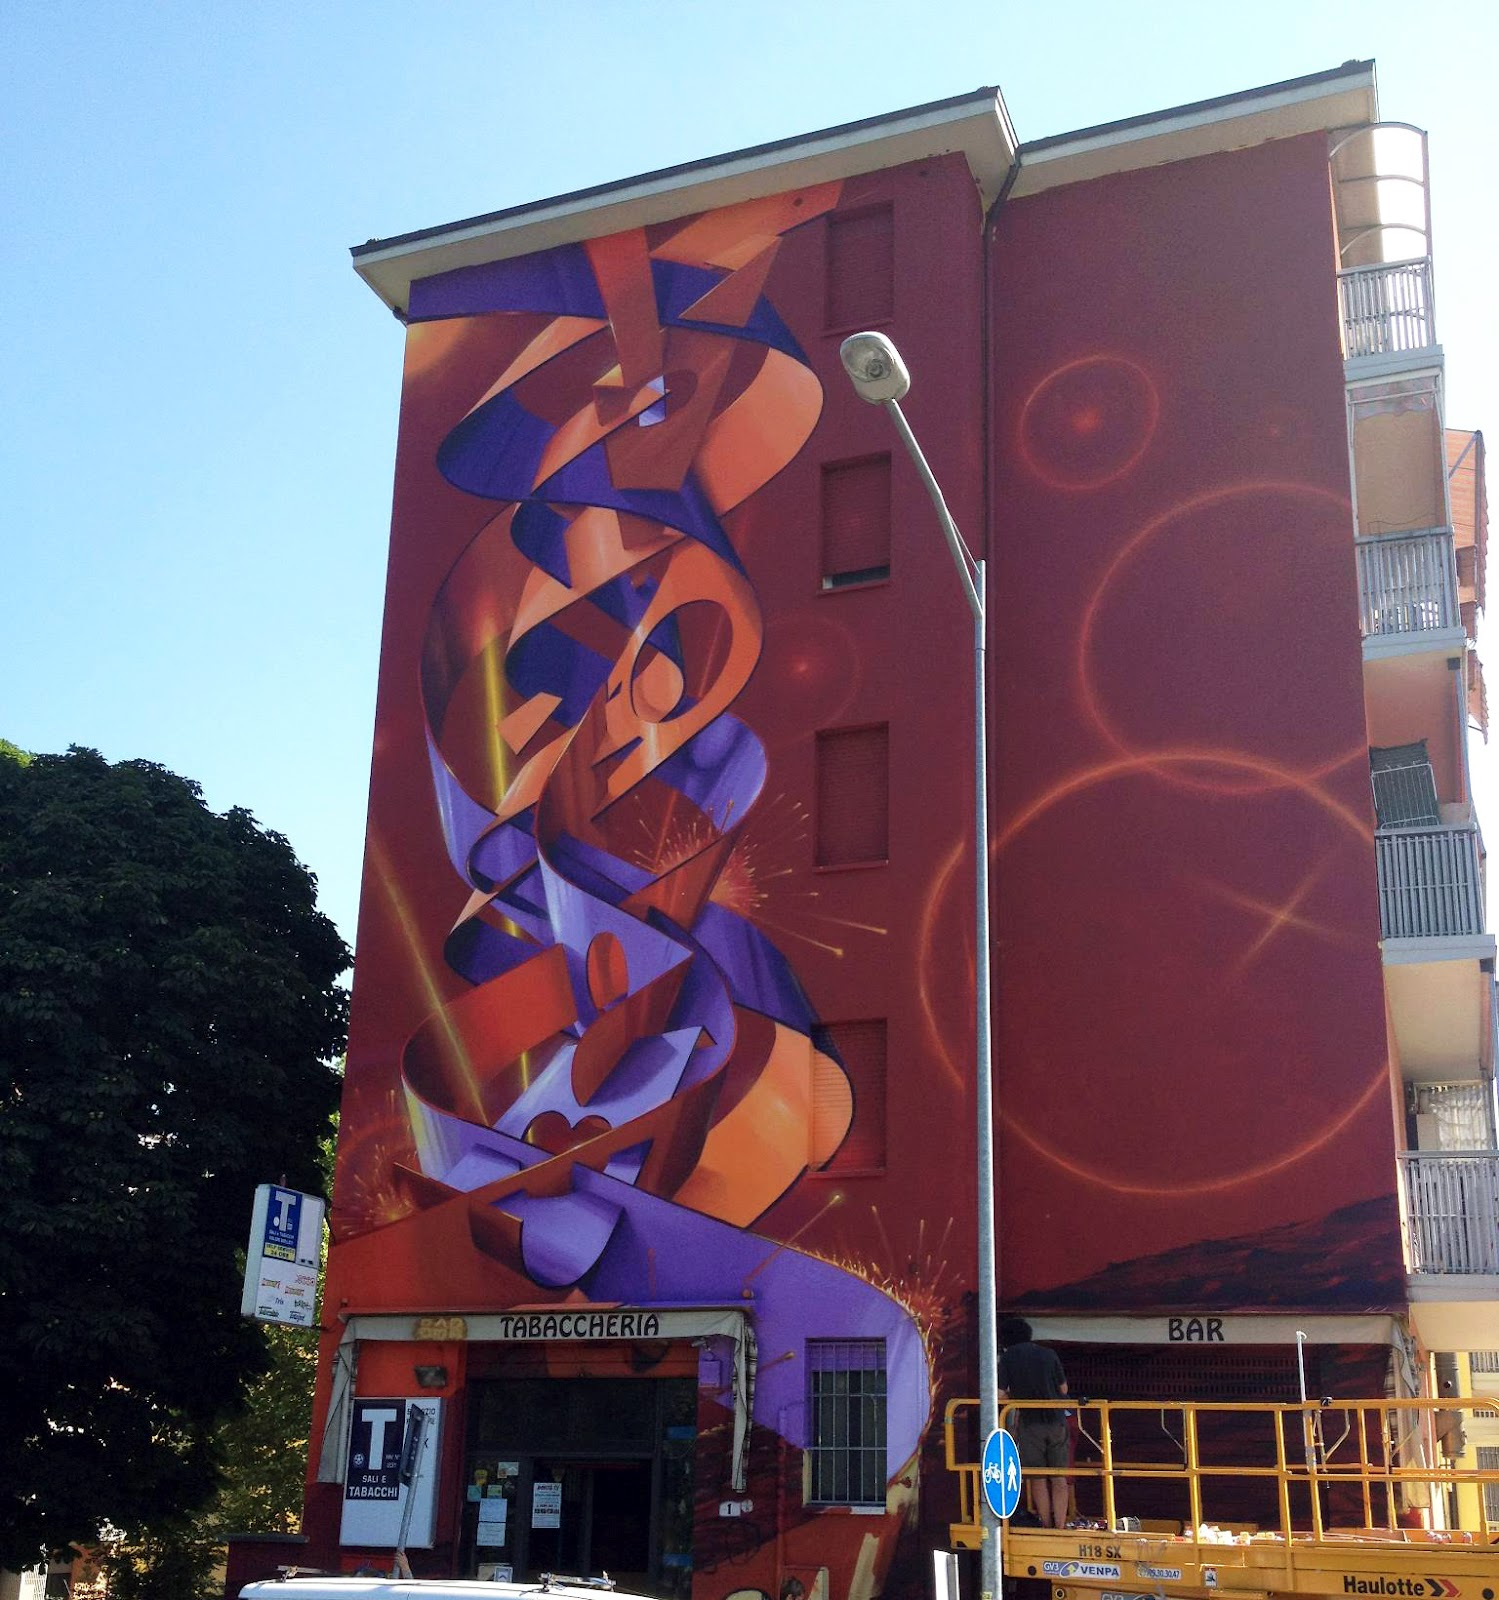 Dado new mural in bologna italy streetartnews for Dado arredamenti modena